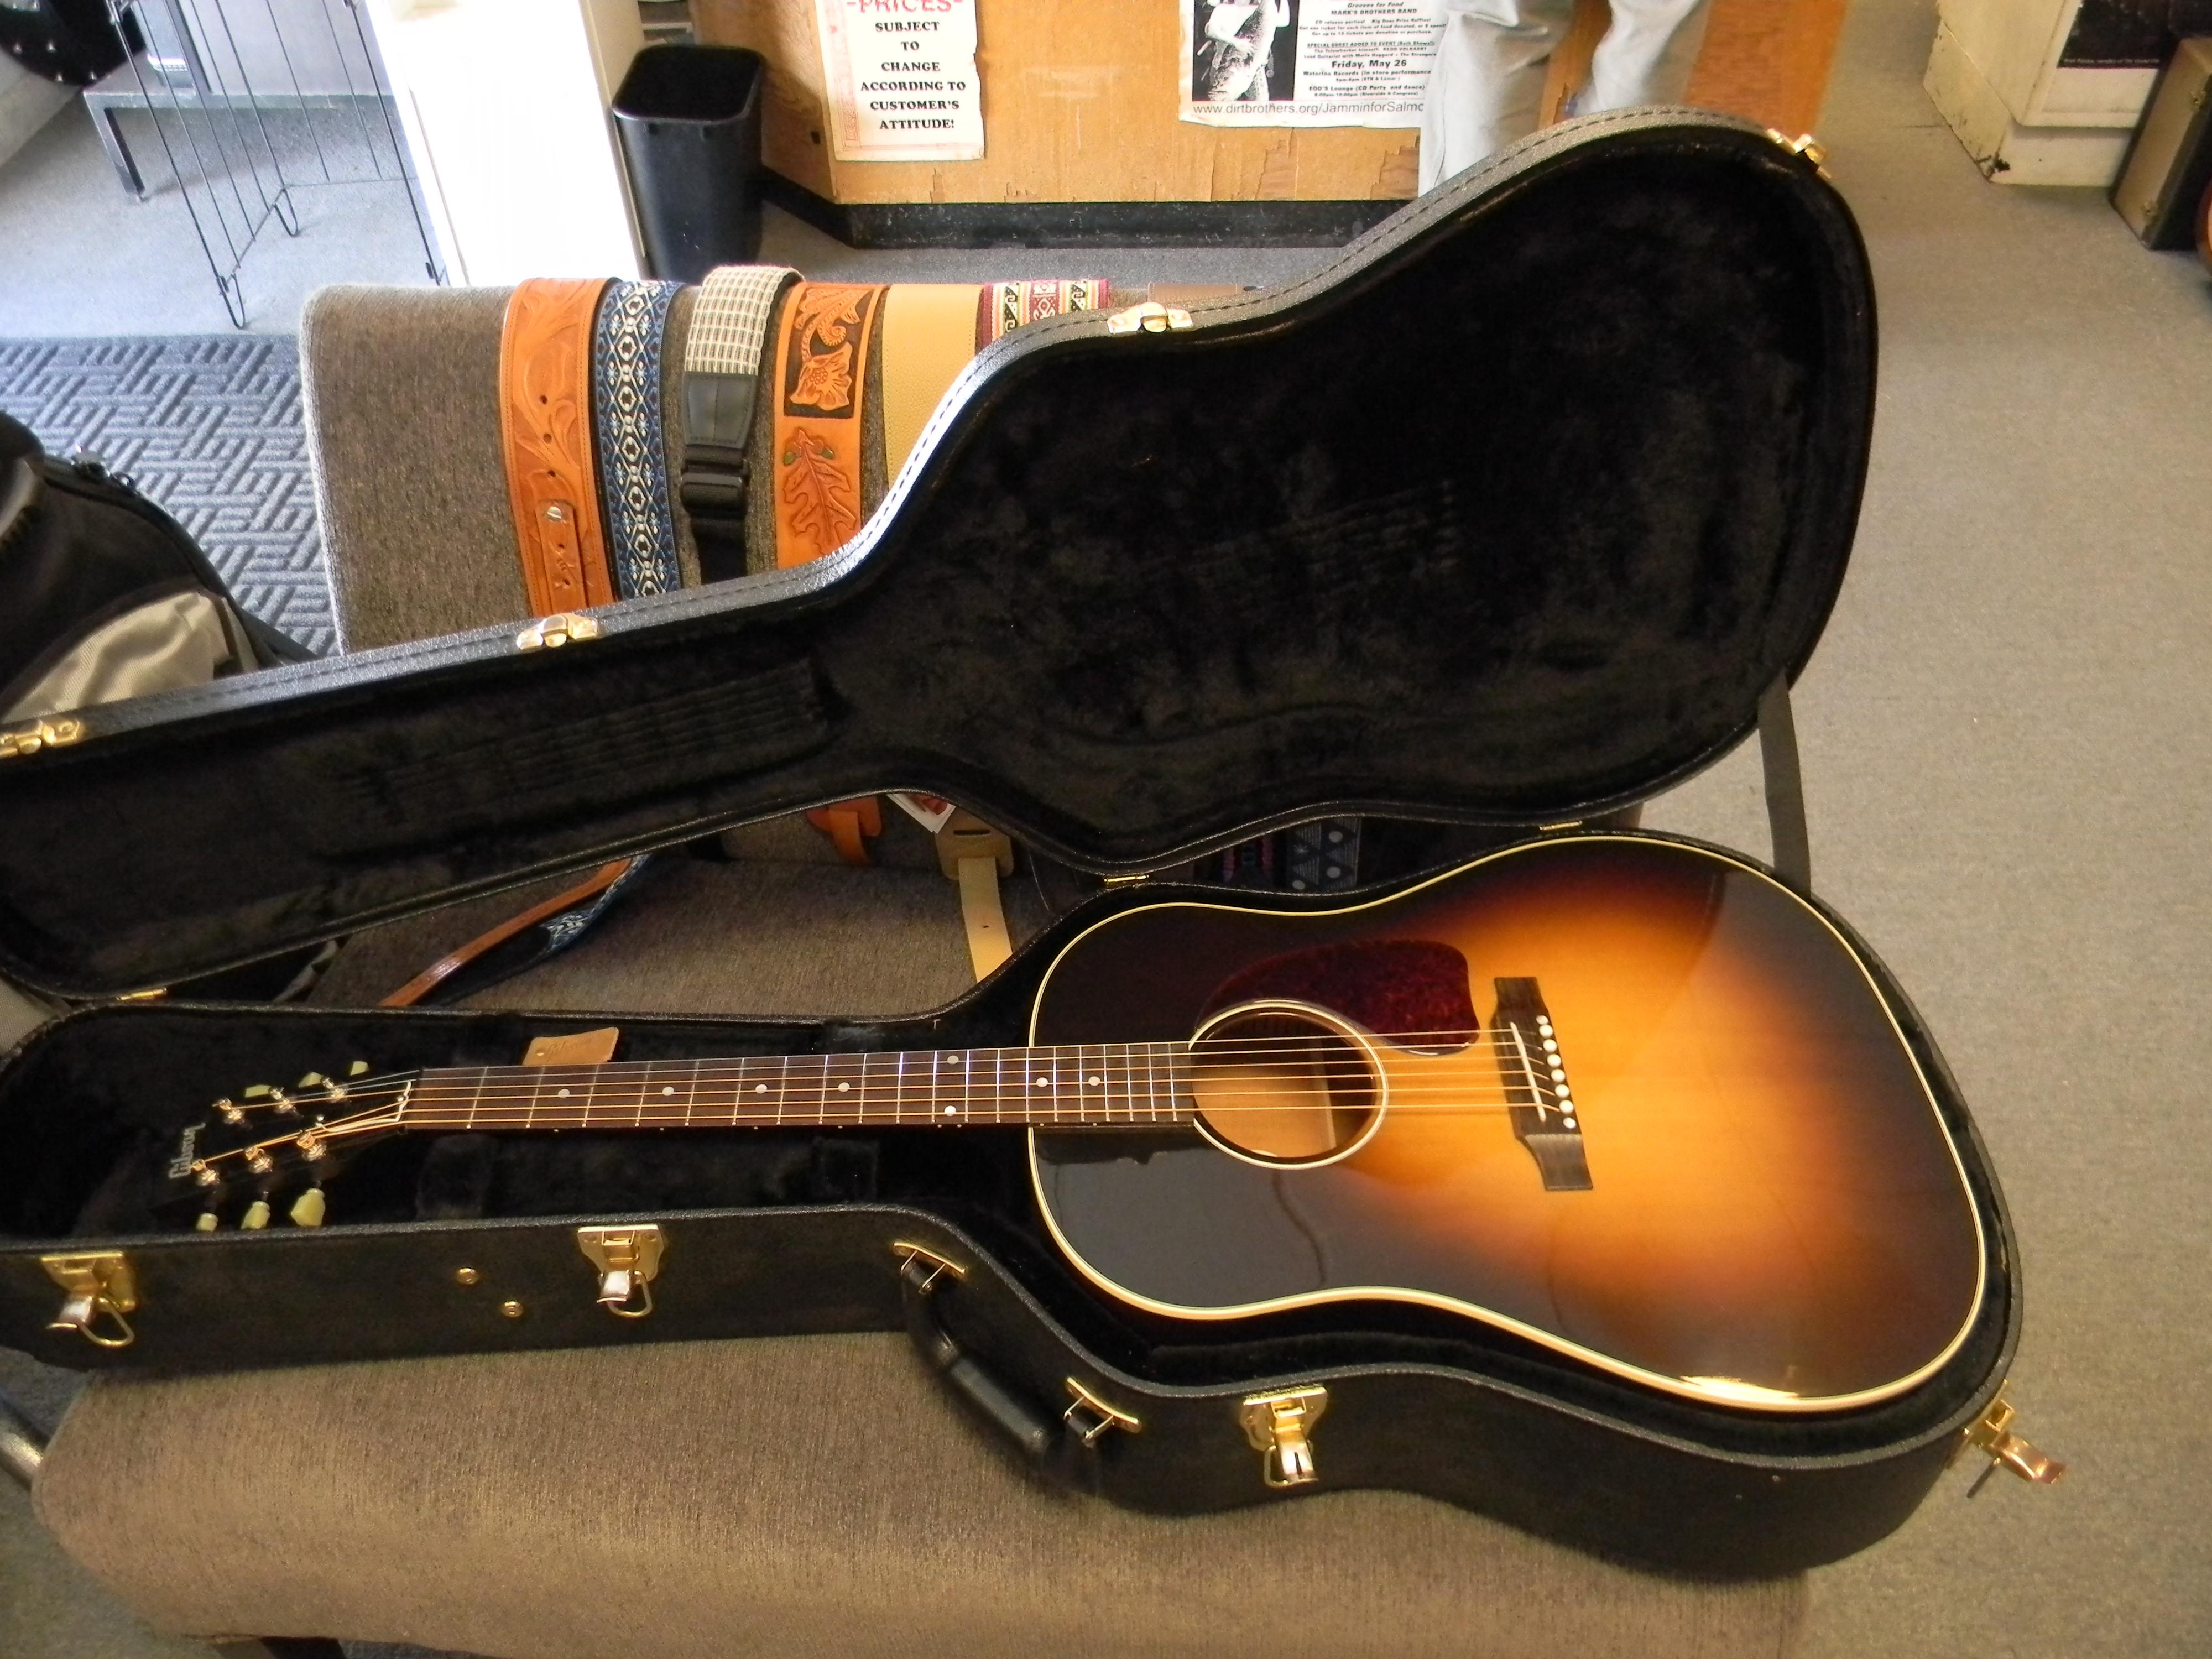 dscn5867 san antonio guitar store guitar tex. Black Bedroom Furniture Sets. Home Design Ideas